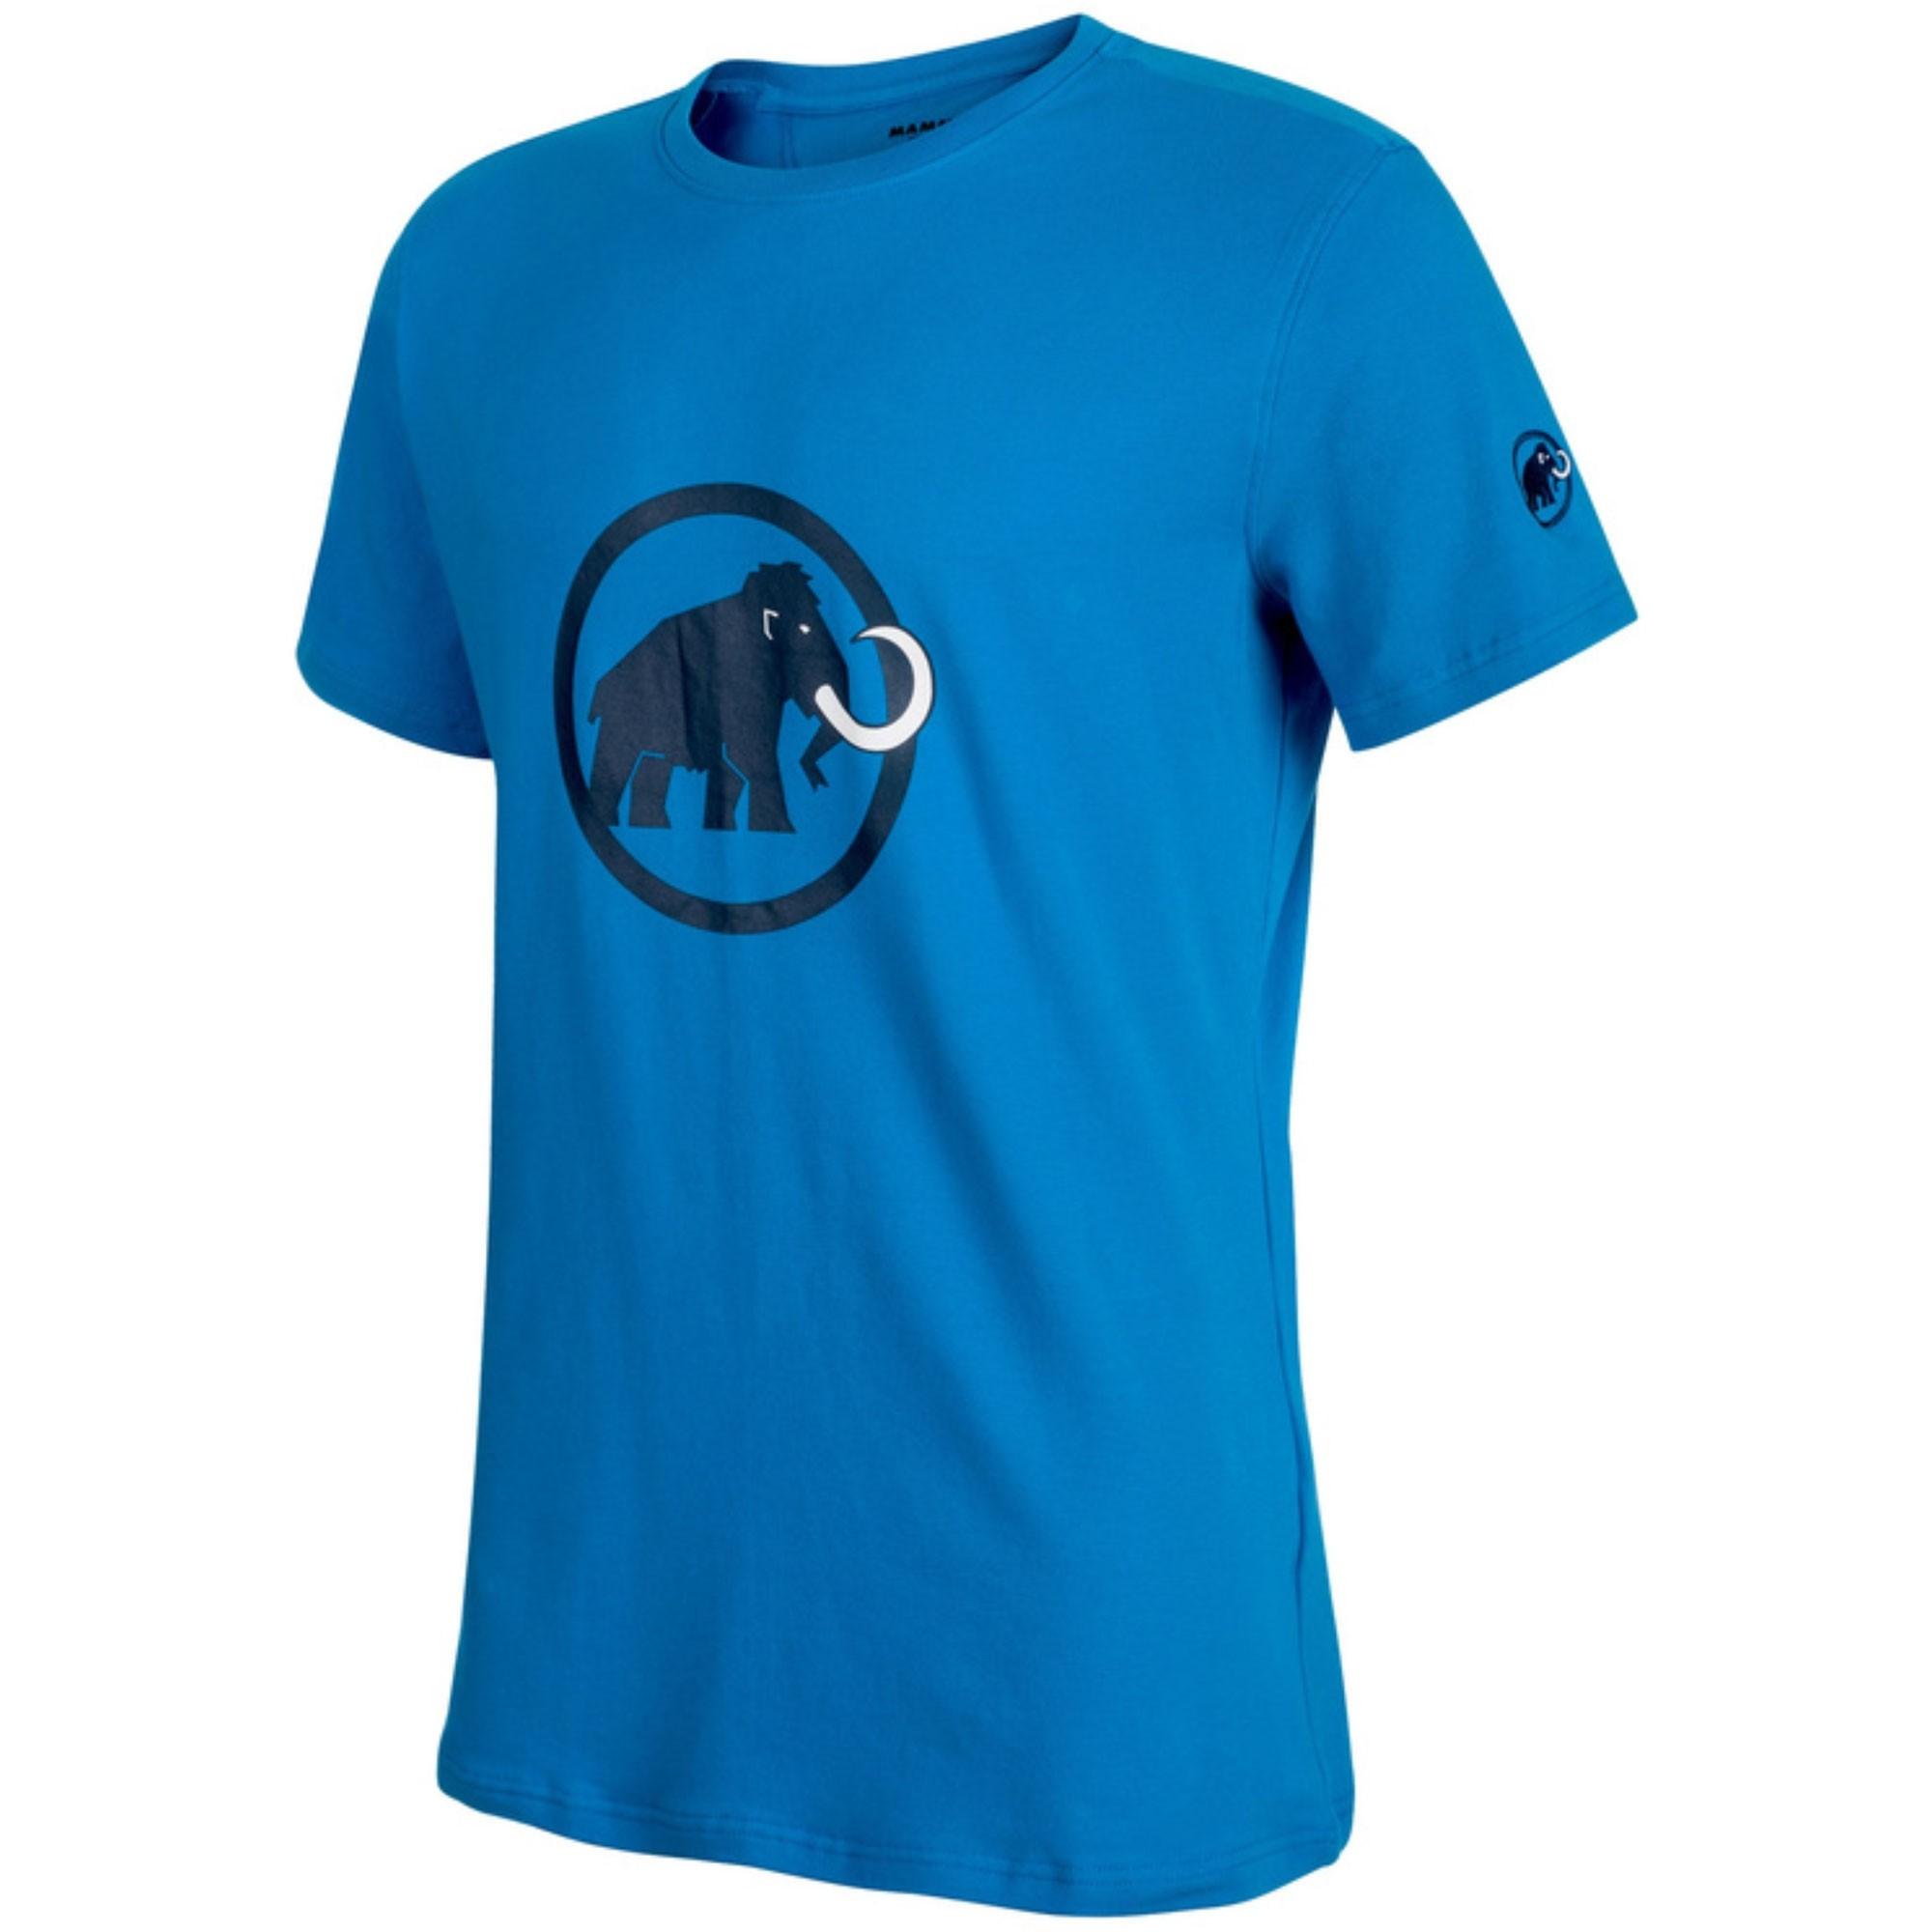 Mammut Logo T-Shirt - Imperial/Jay